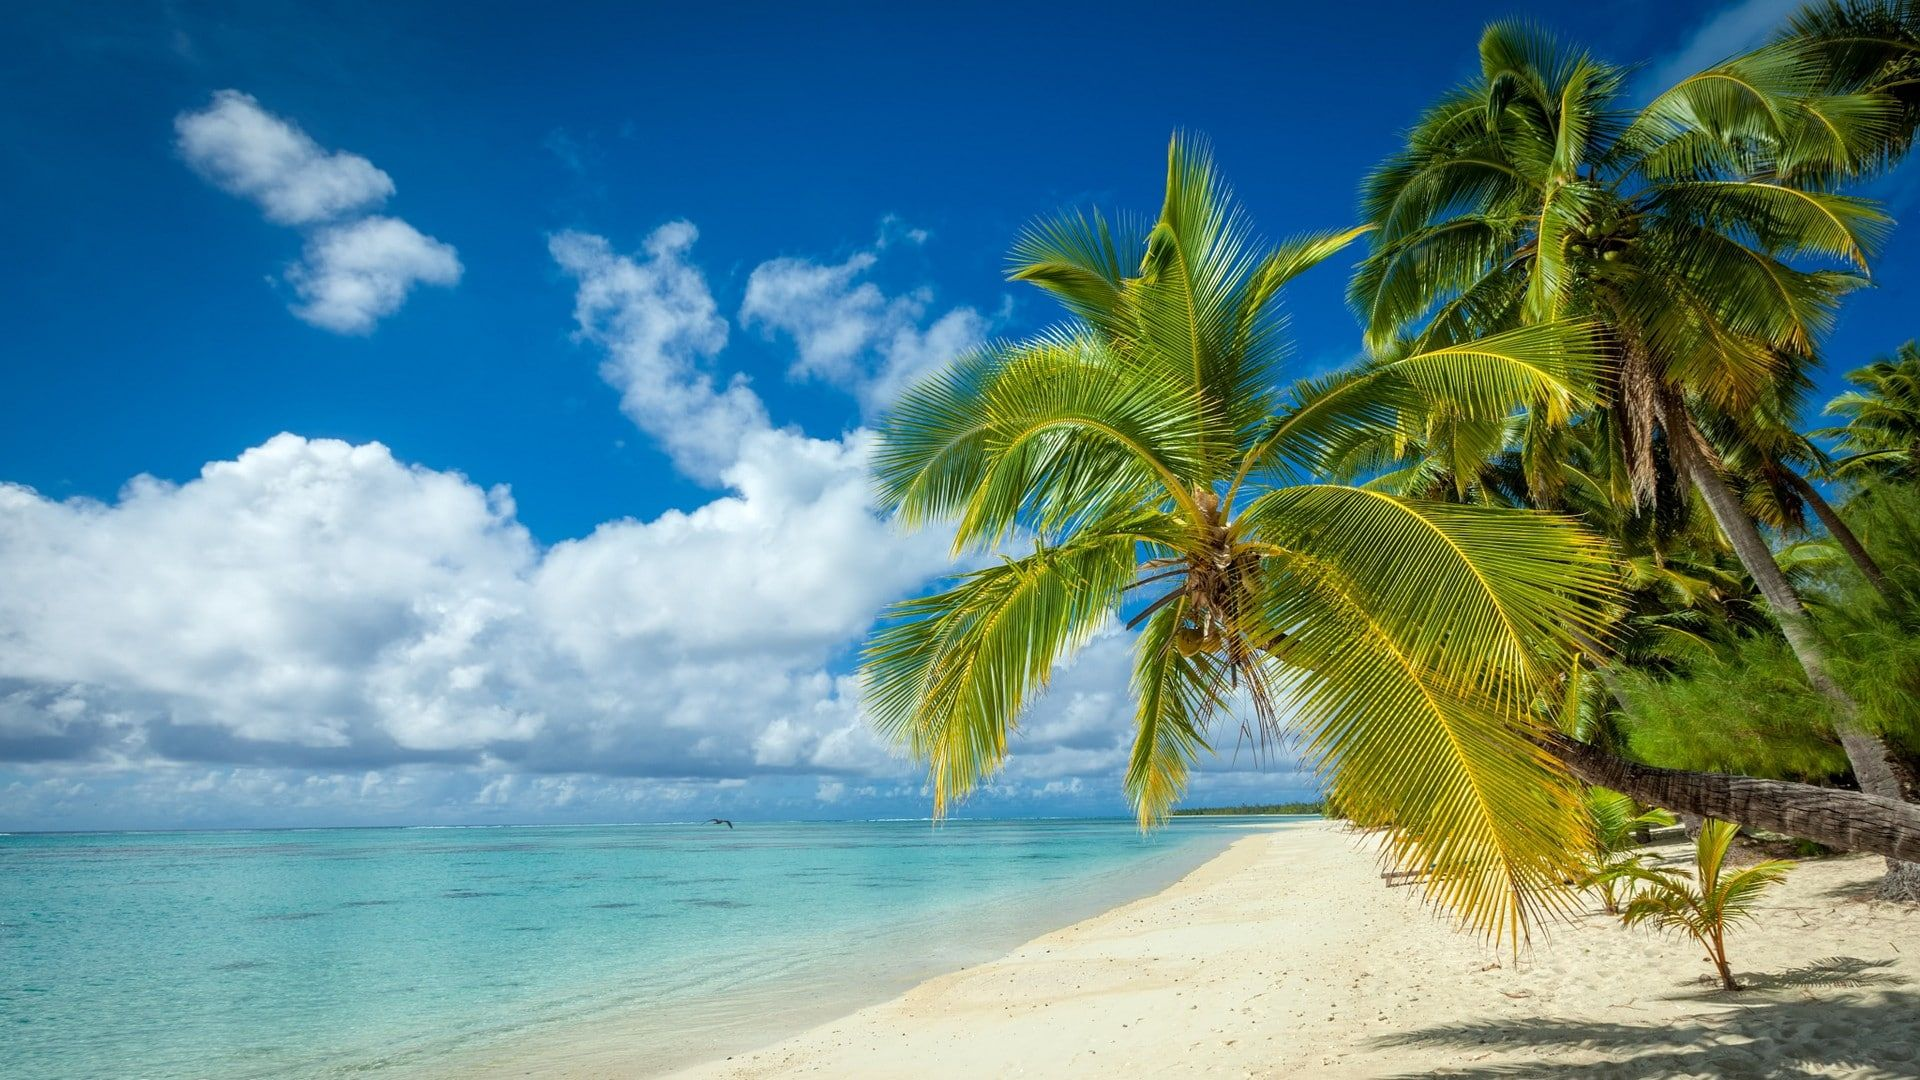 Nature Landscape Tropical Island Beach Palm Trees White Sand Sea Summer Clouds 1080p Wallpaper Hd Palm Trees Beach Wallpaper Tropical Island Beach Tropical island beach palm sea sand